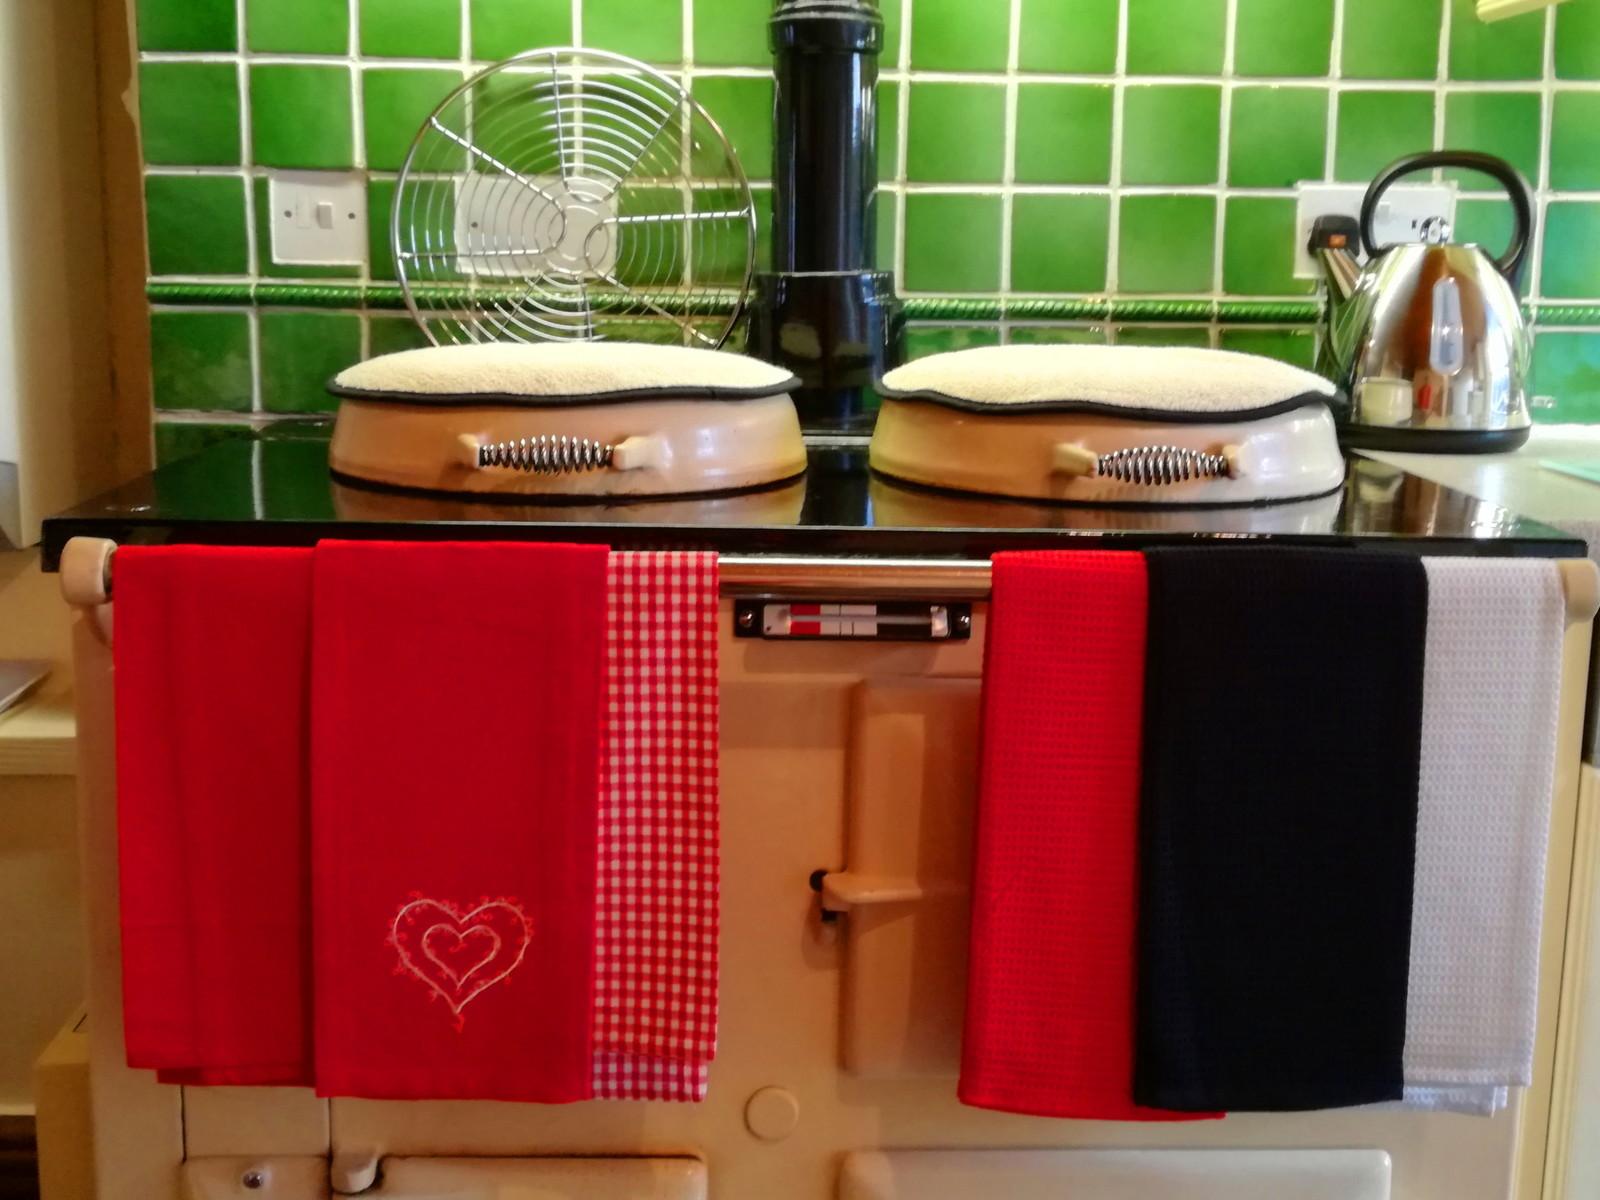 The wonderfully warm AGA stove